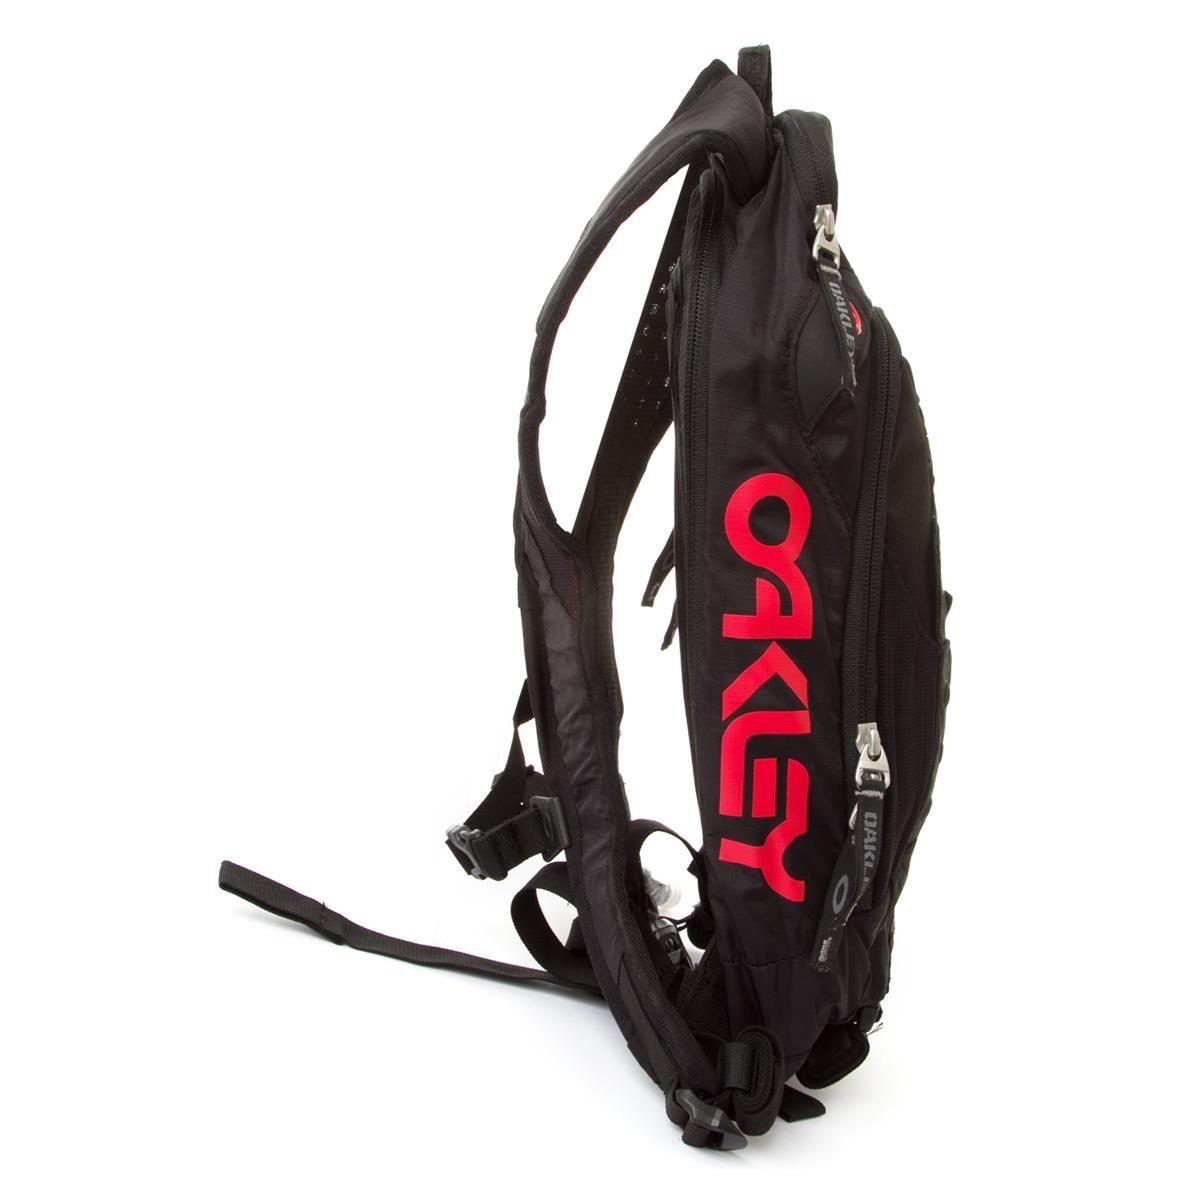 Oakley Short Circuit Pack Black Sema Data Co Op Backpack 2013 Pinterest Hydration Maciag Offroad